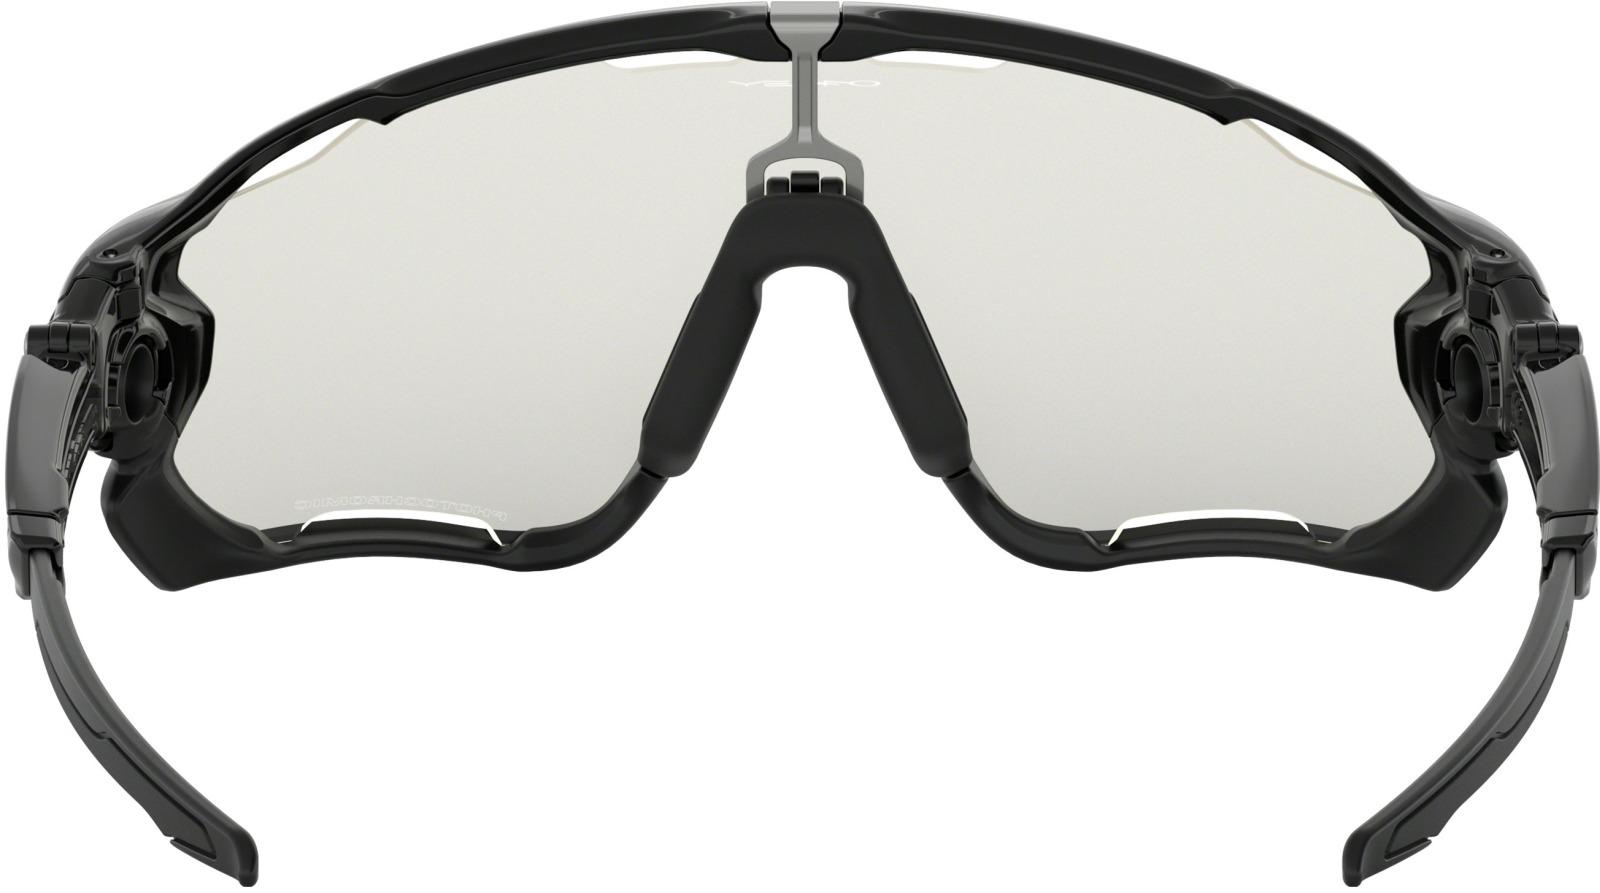 2279cb2e813 Oakley Jawbreaker Clear Black Photochromic Lenses - Eyewear - Cycle ...